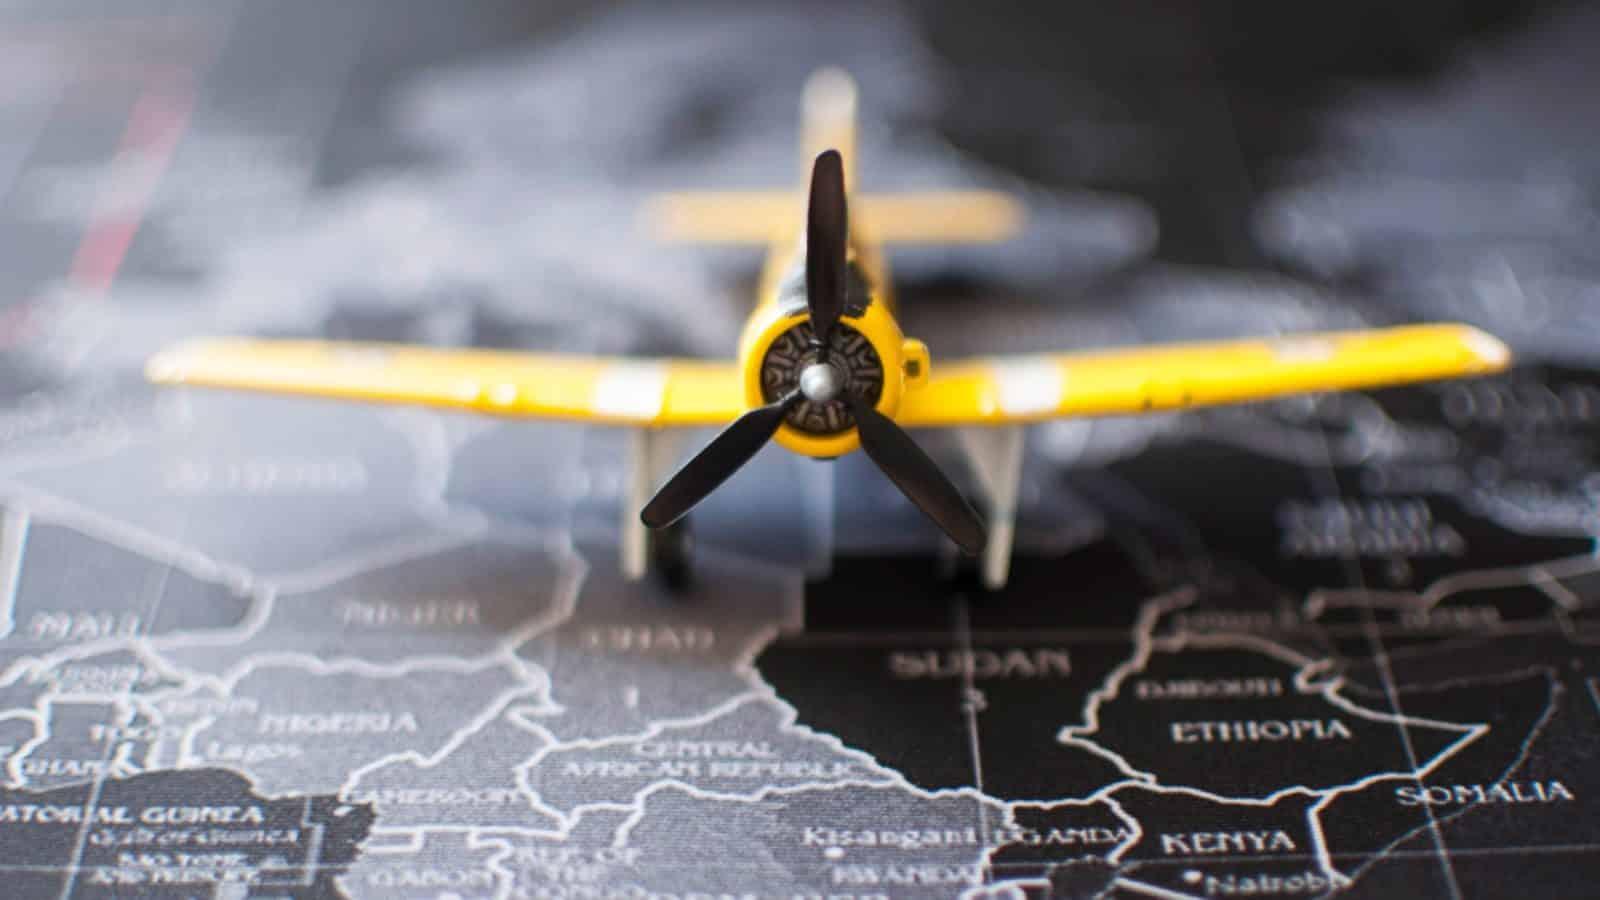 travel-during-pandemic-airplane